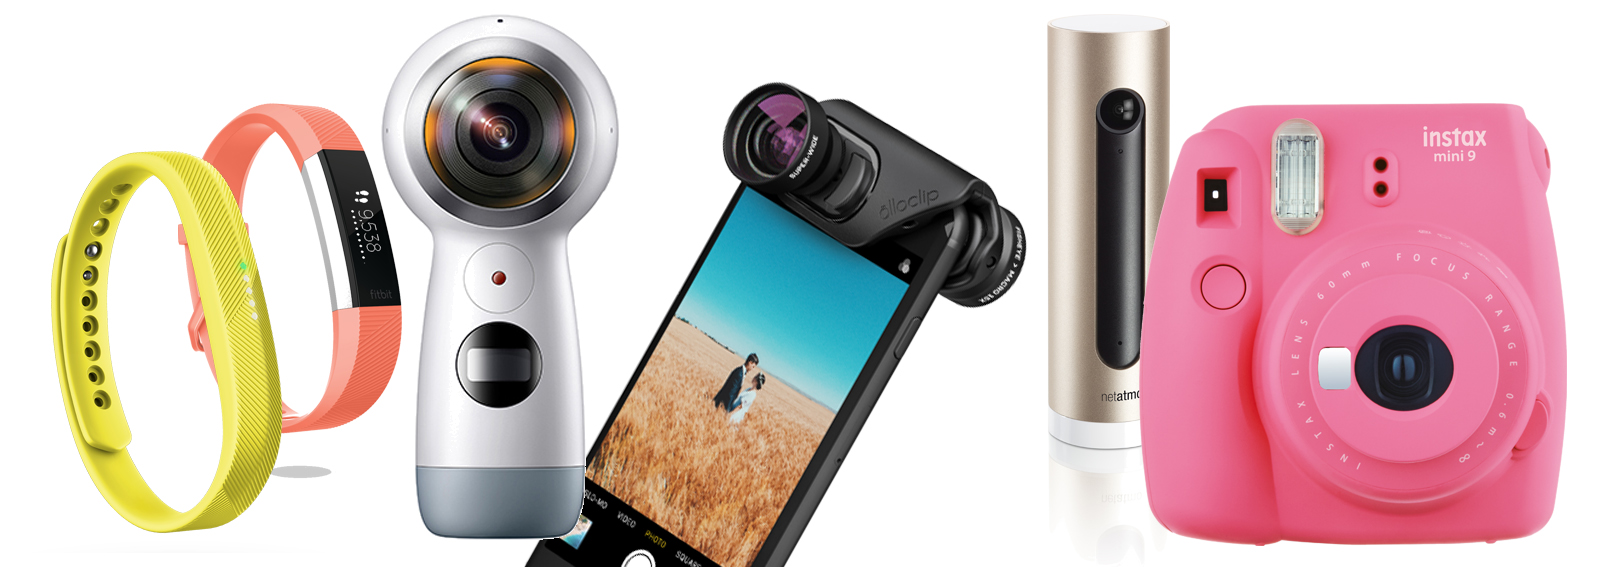 Gadget vacanza tech, 5 imperdibili per le vacanze